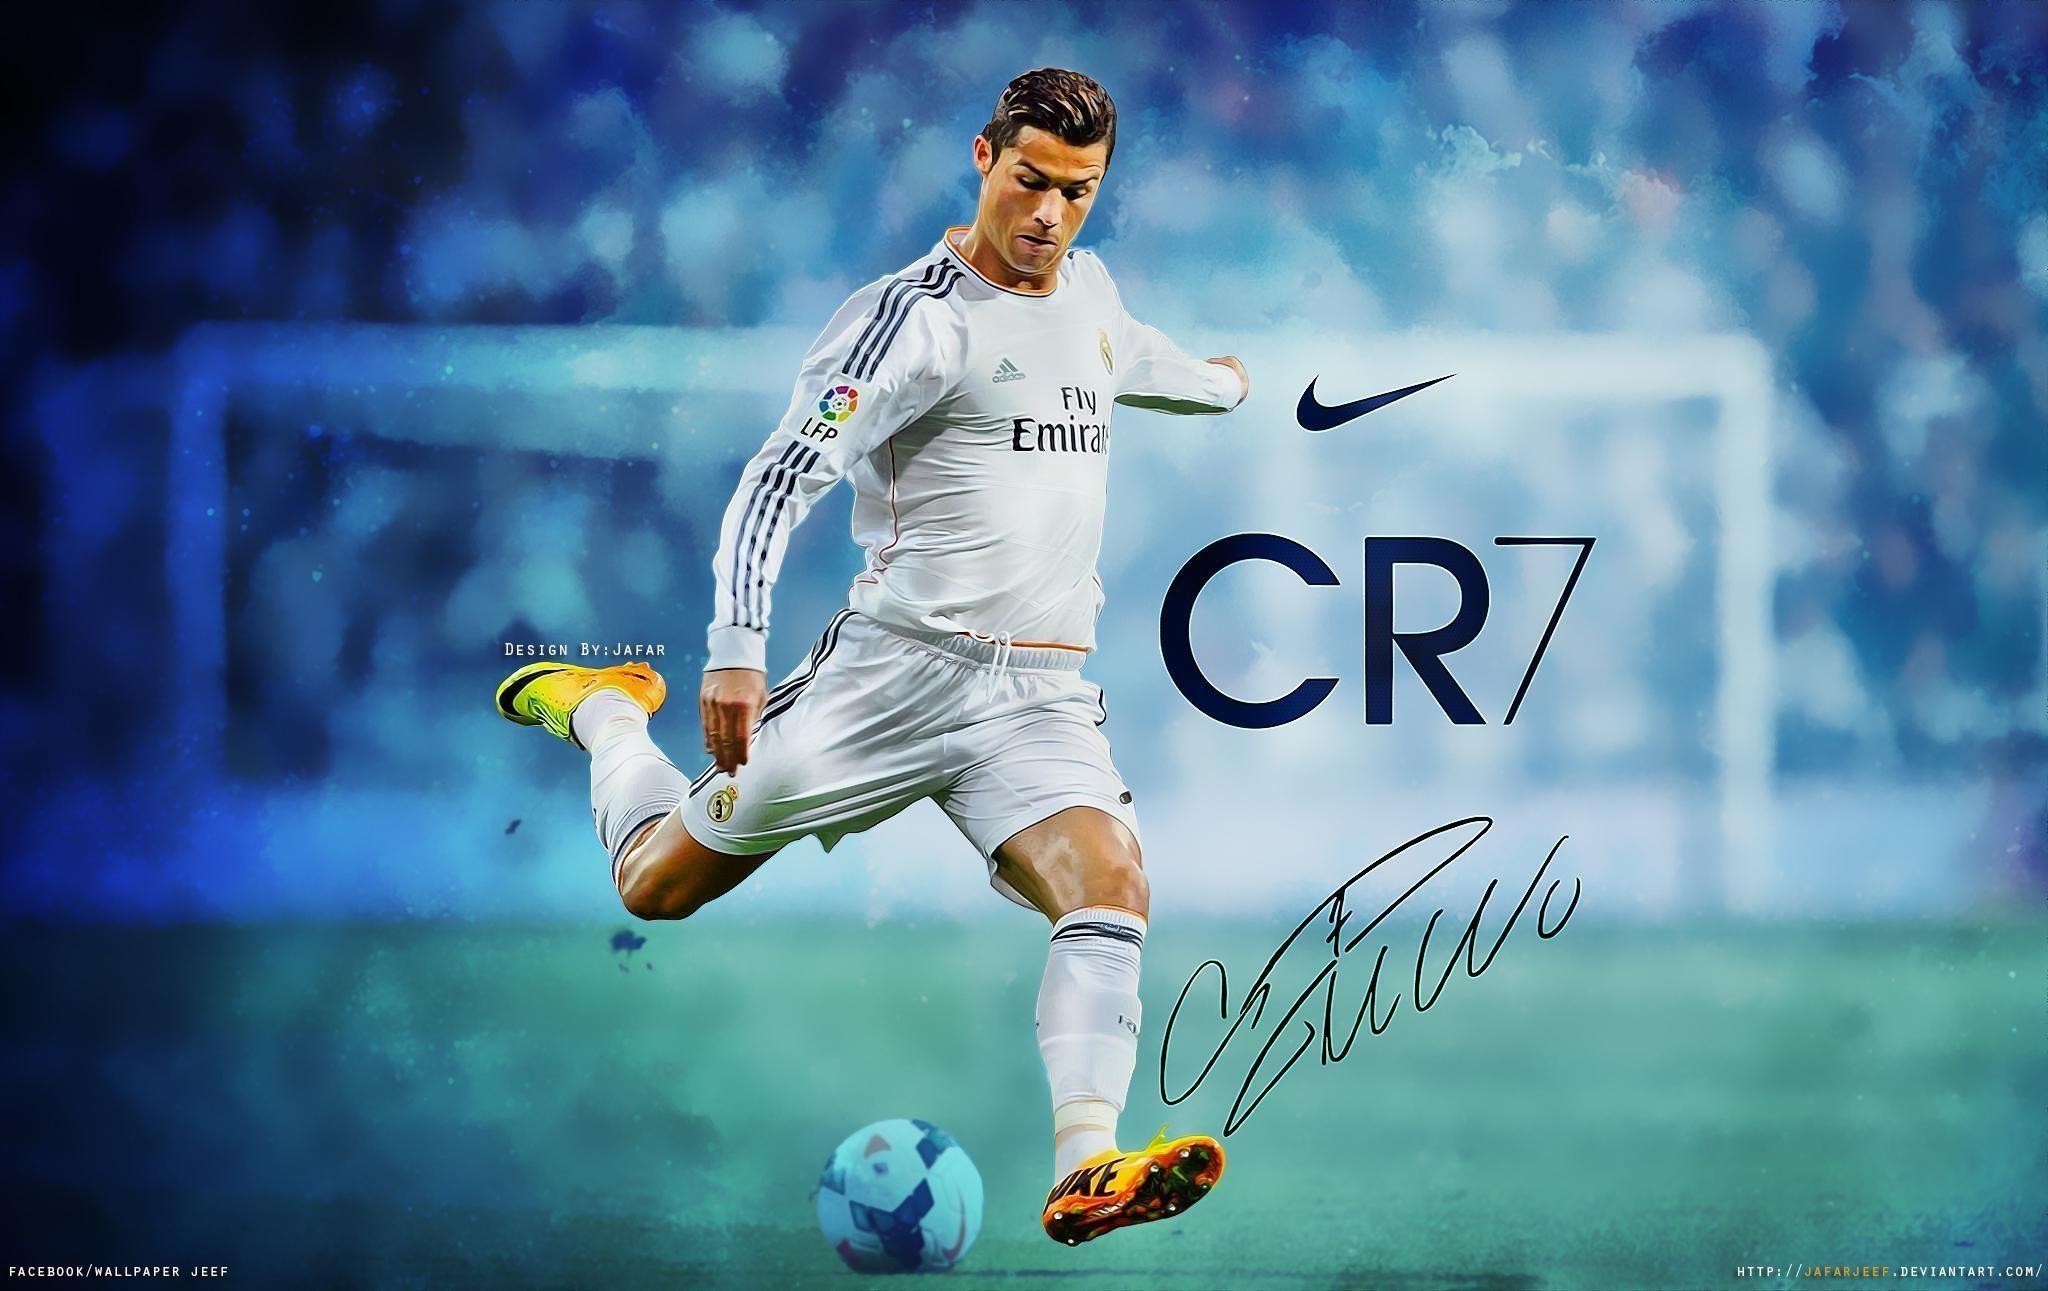 Cristiano Ronaldo Wallpaper 1080p 74 Images